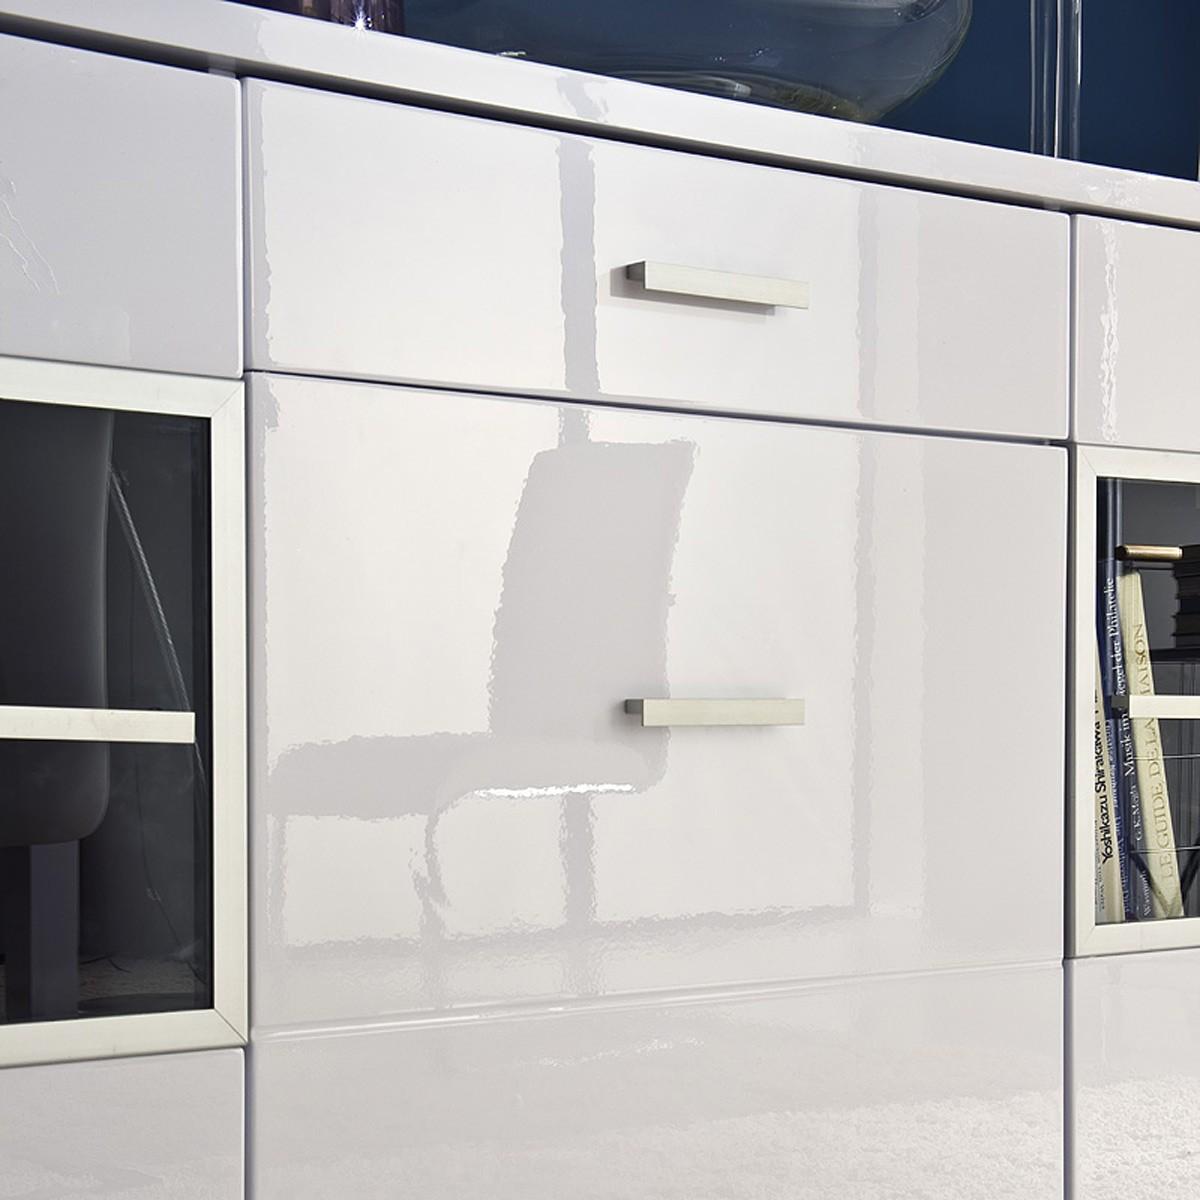 miniaturbild. Black Bedroom Furniture Sets. Home Design Ideas